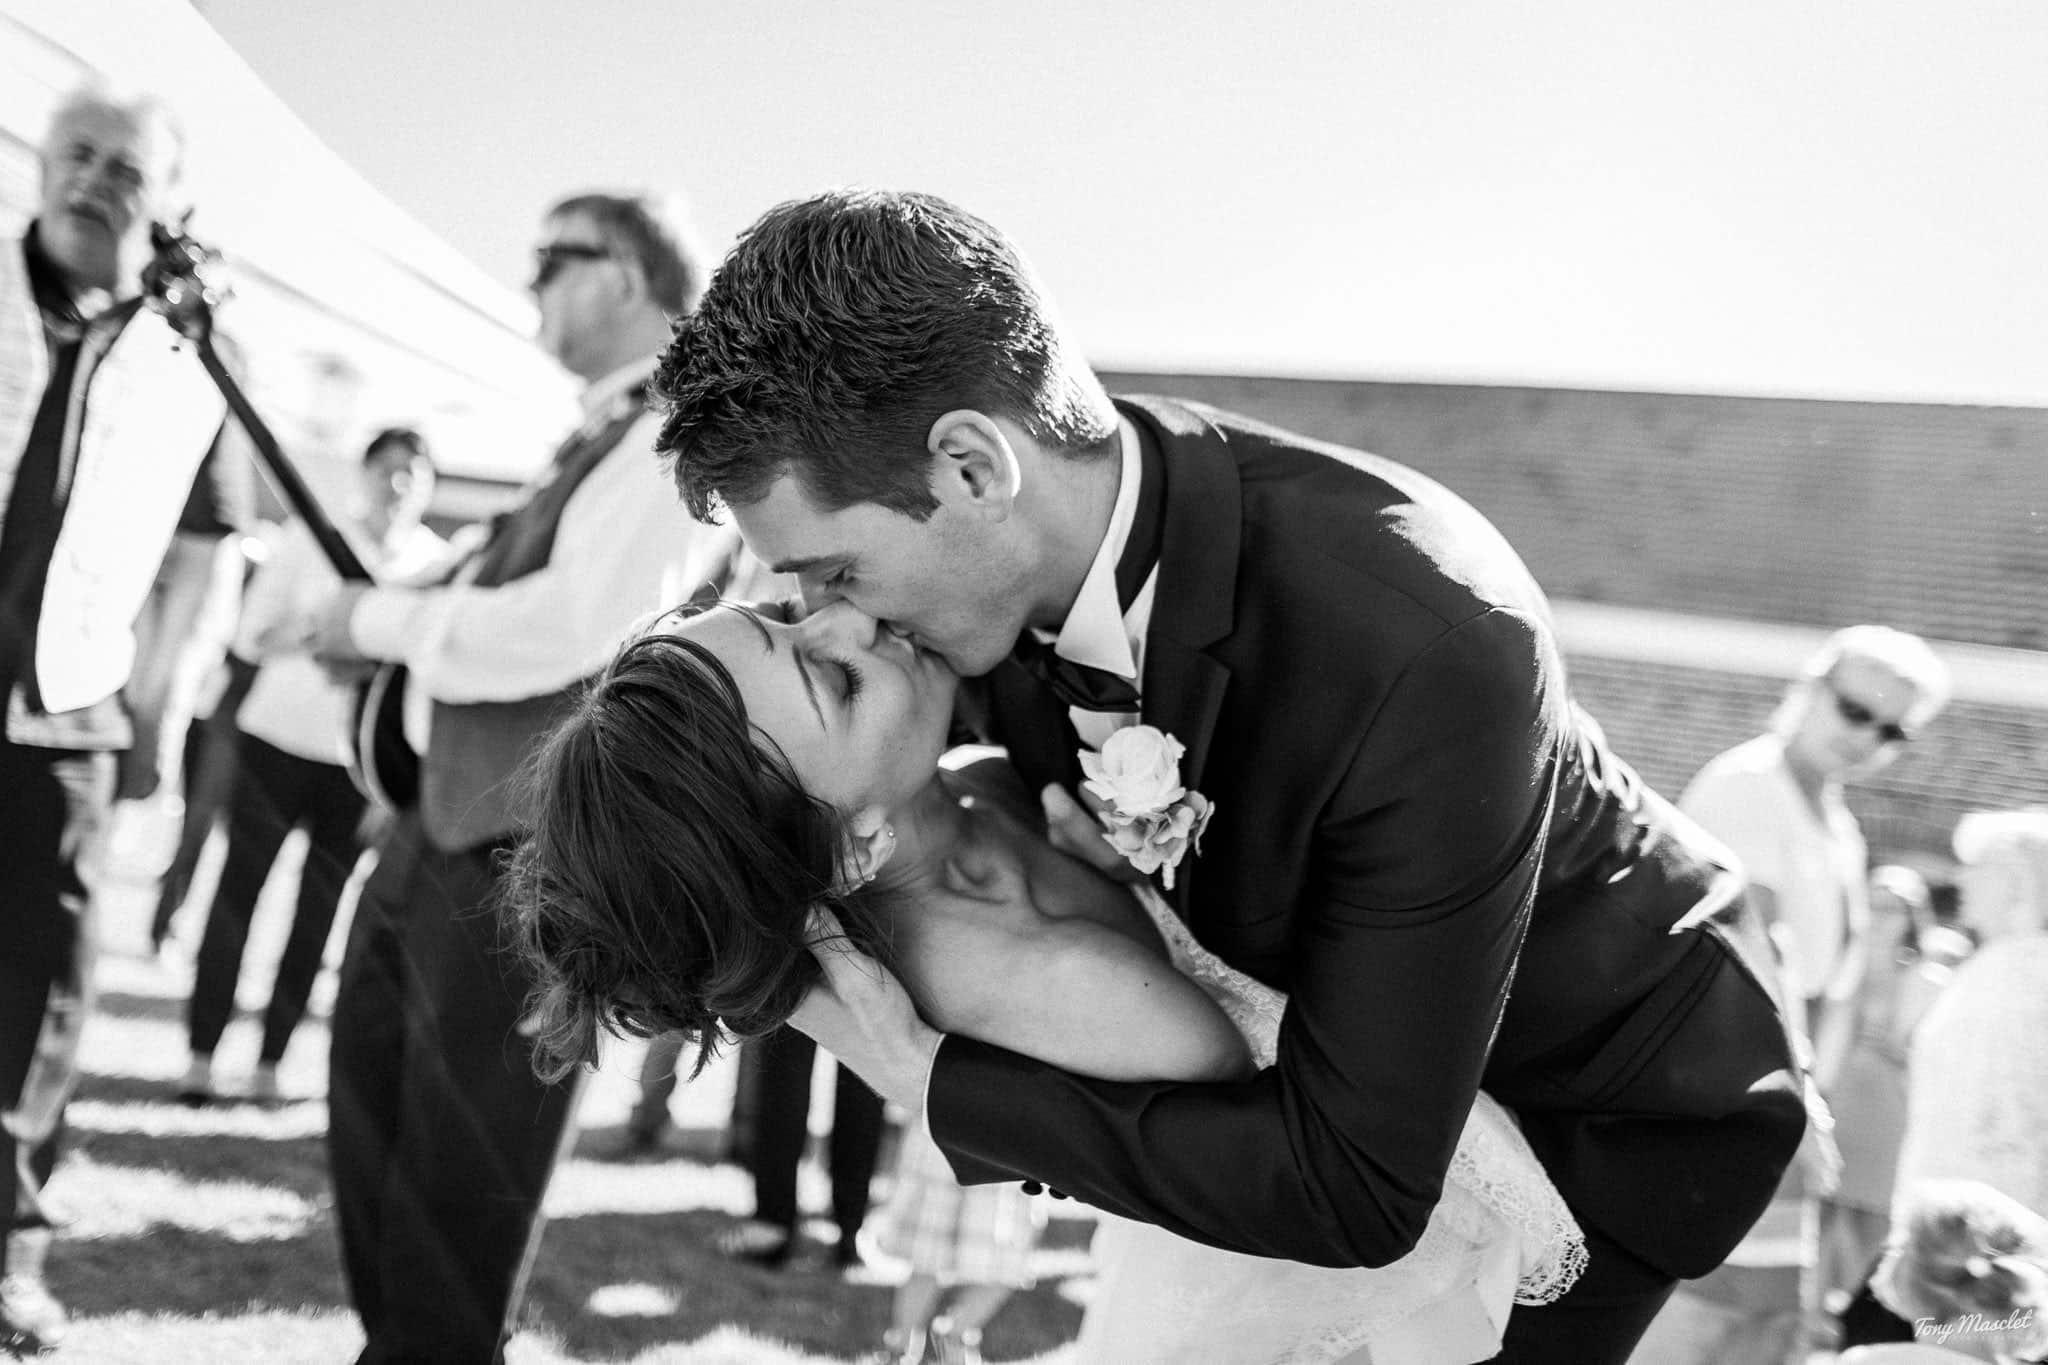 photographe mariage lille nord tourcoing bondues